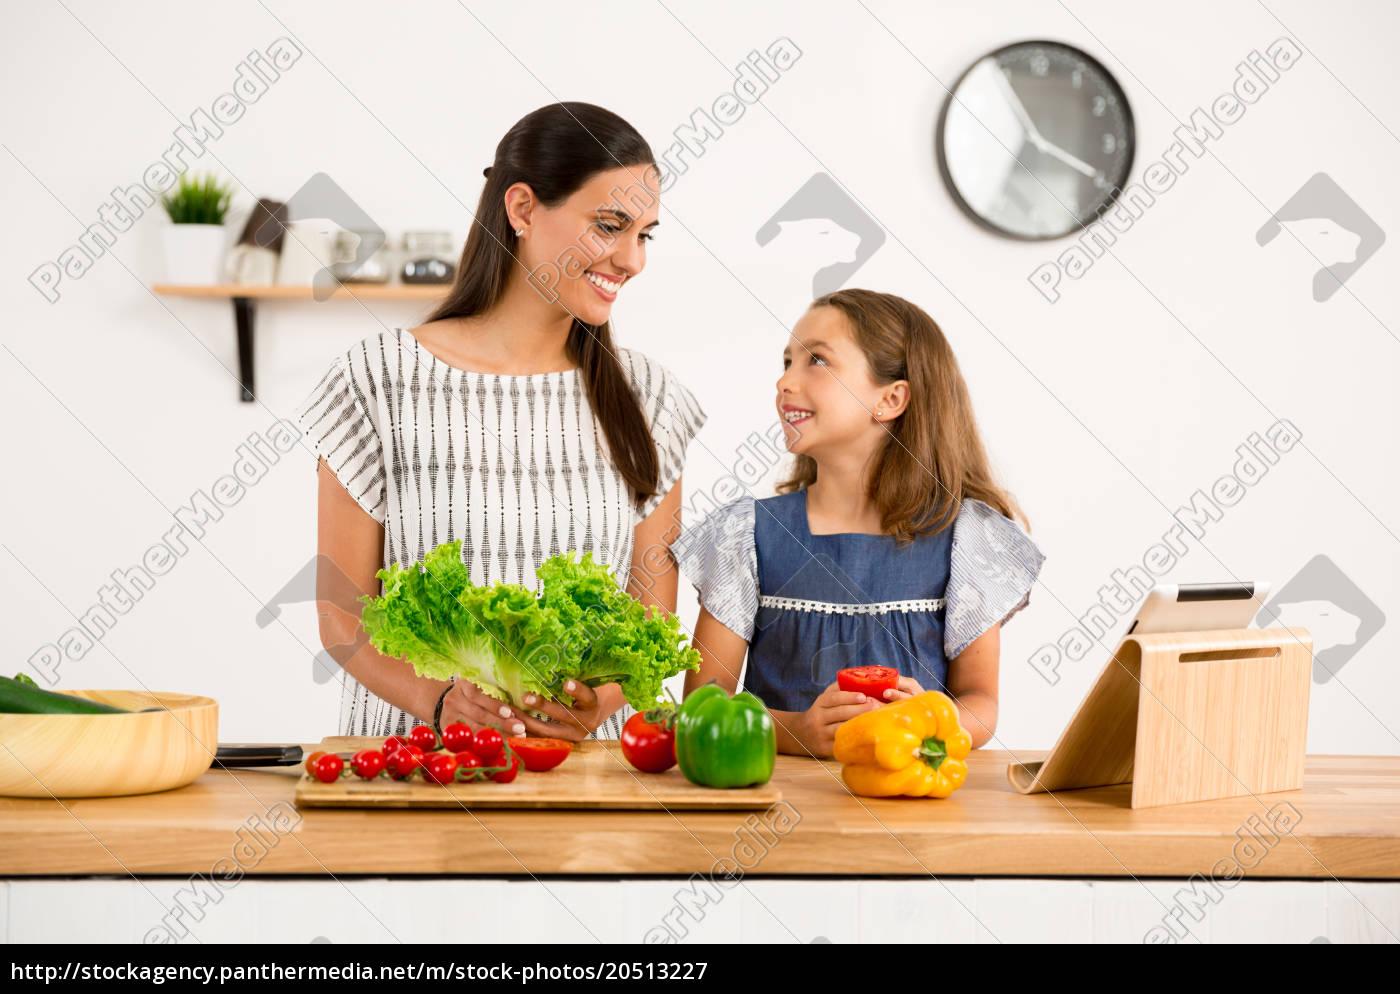 having, fun, in, the, kitchen - 20513227